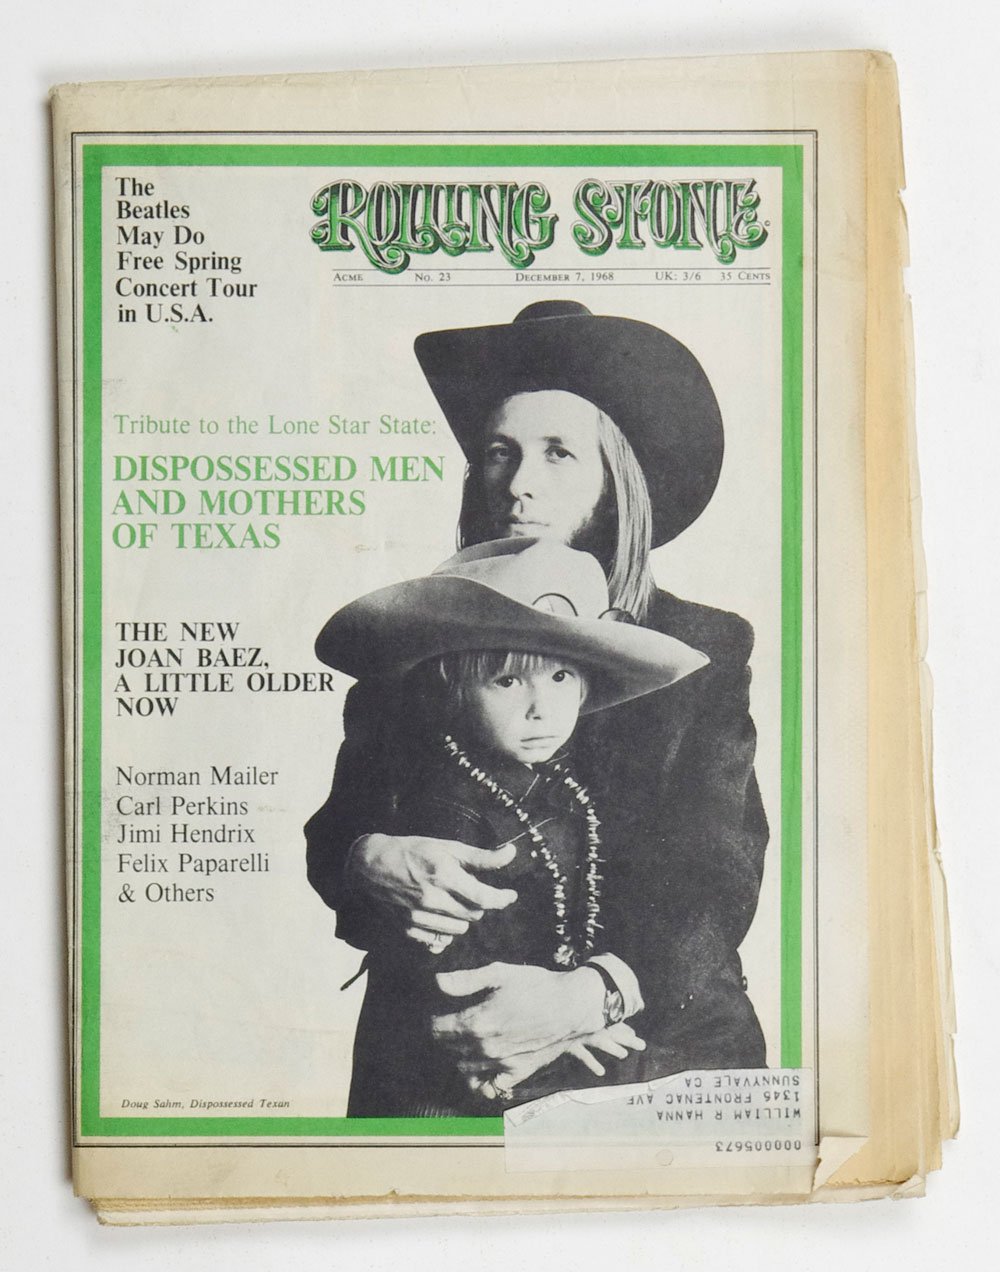 Rolling Stone Magazine 1968 Dec 7 No. 23 Doug Sahm